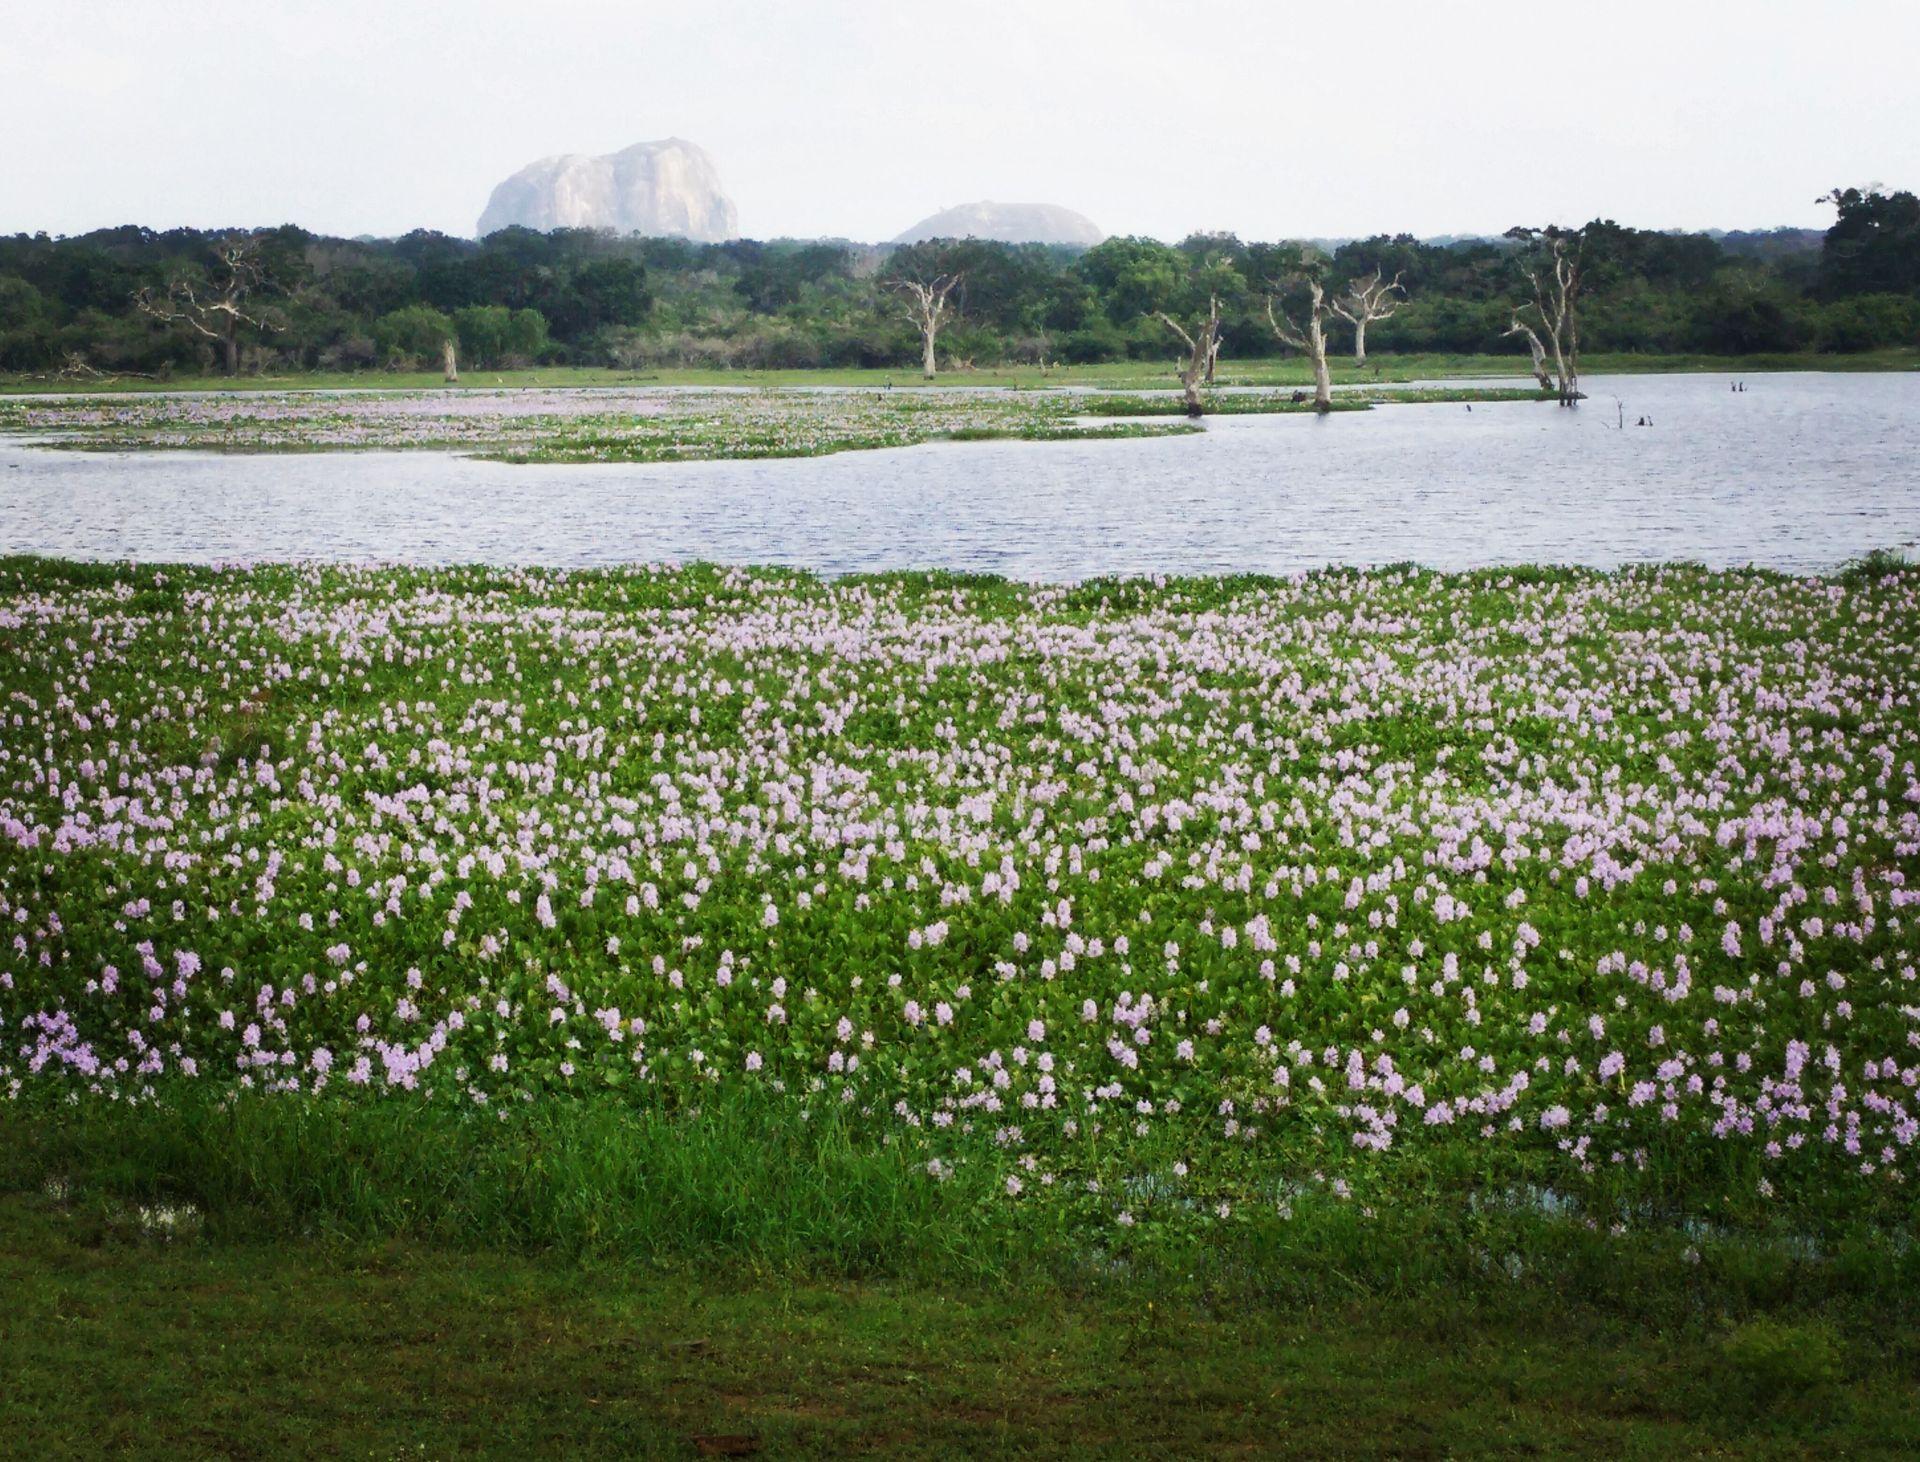 Blumenmeer im Yale Nationalpark